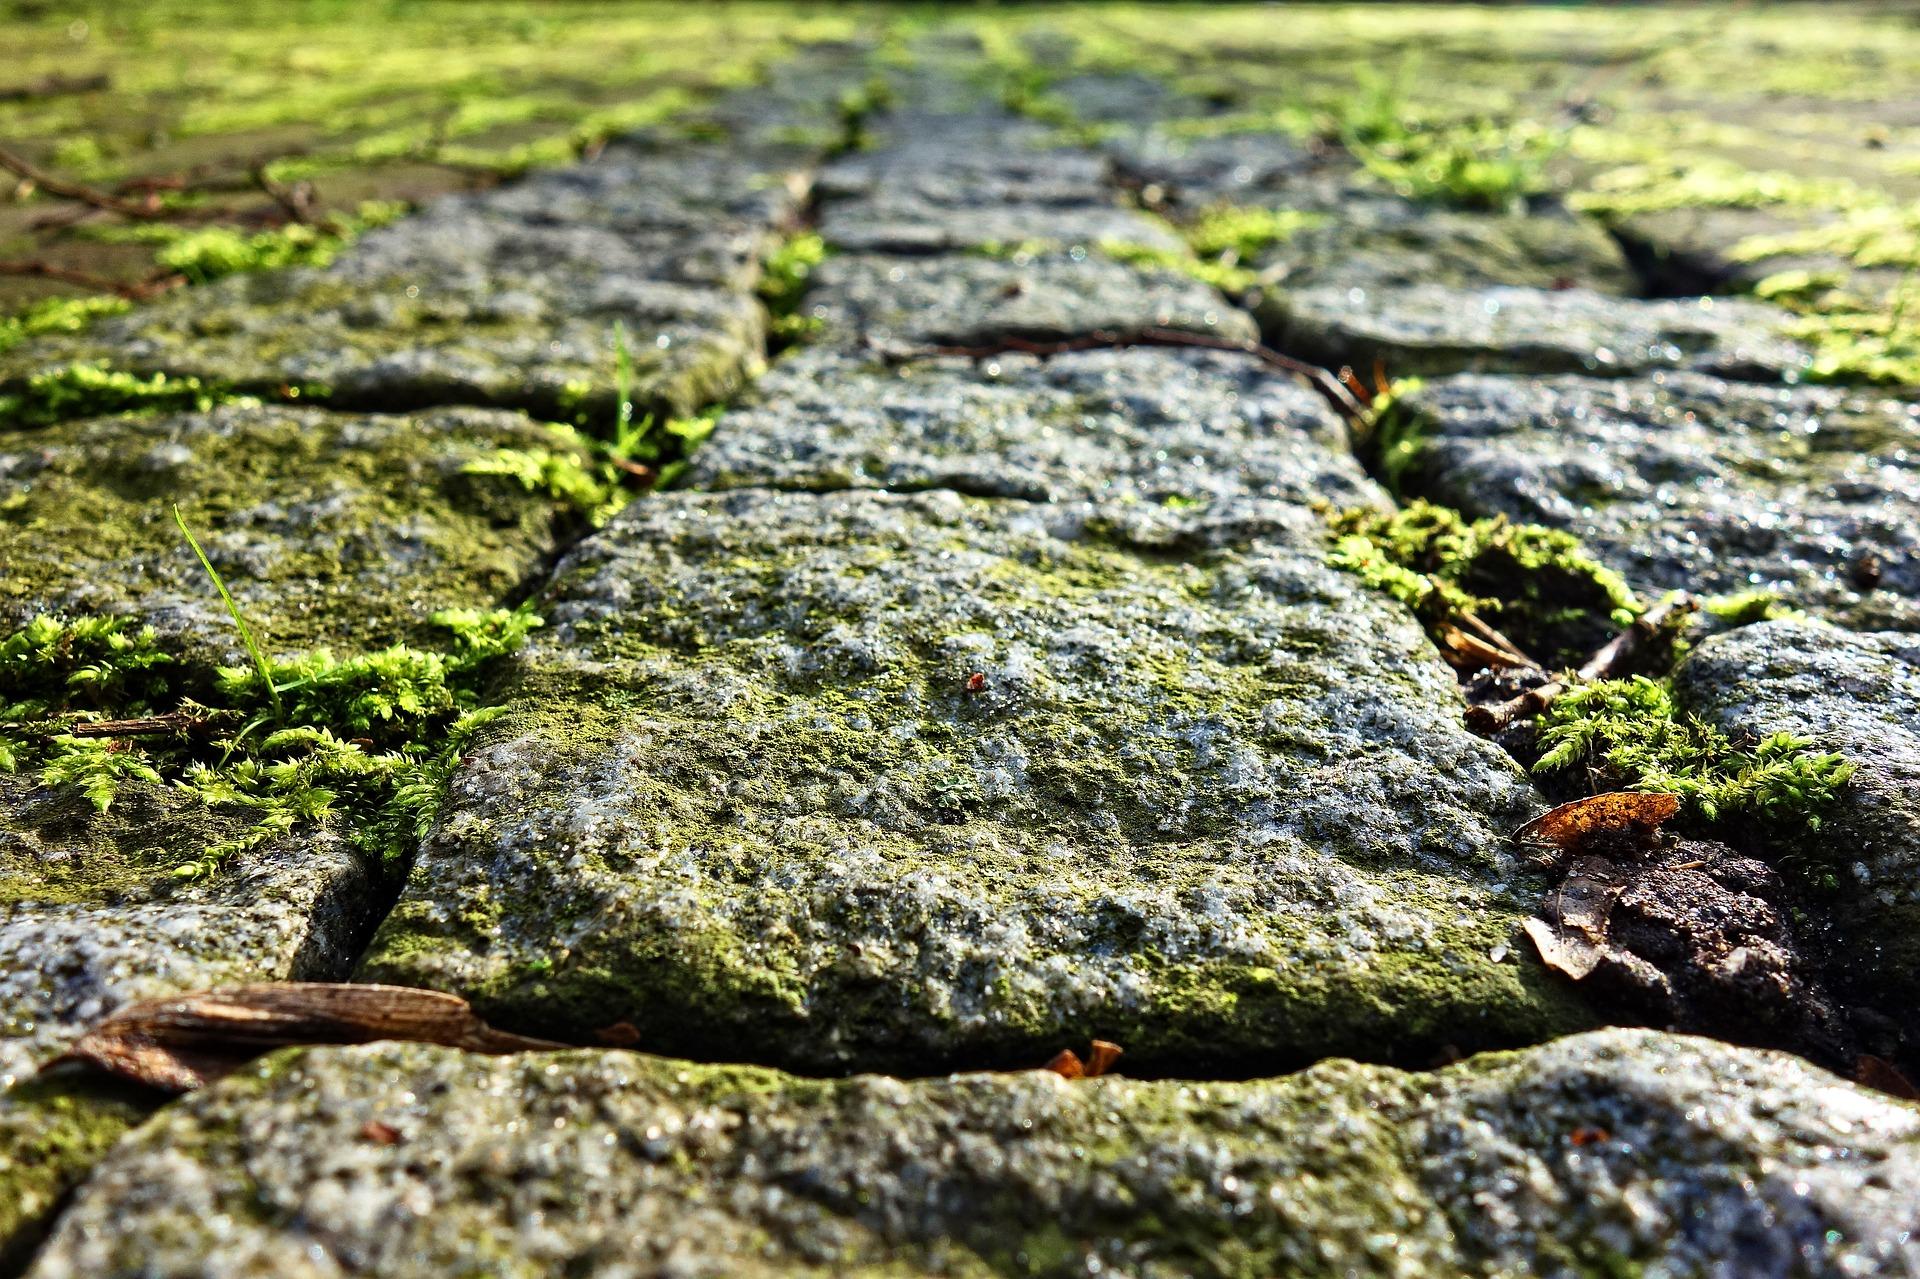 cobble-stone-3097749_1920.jpg